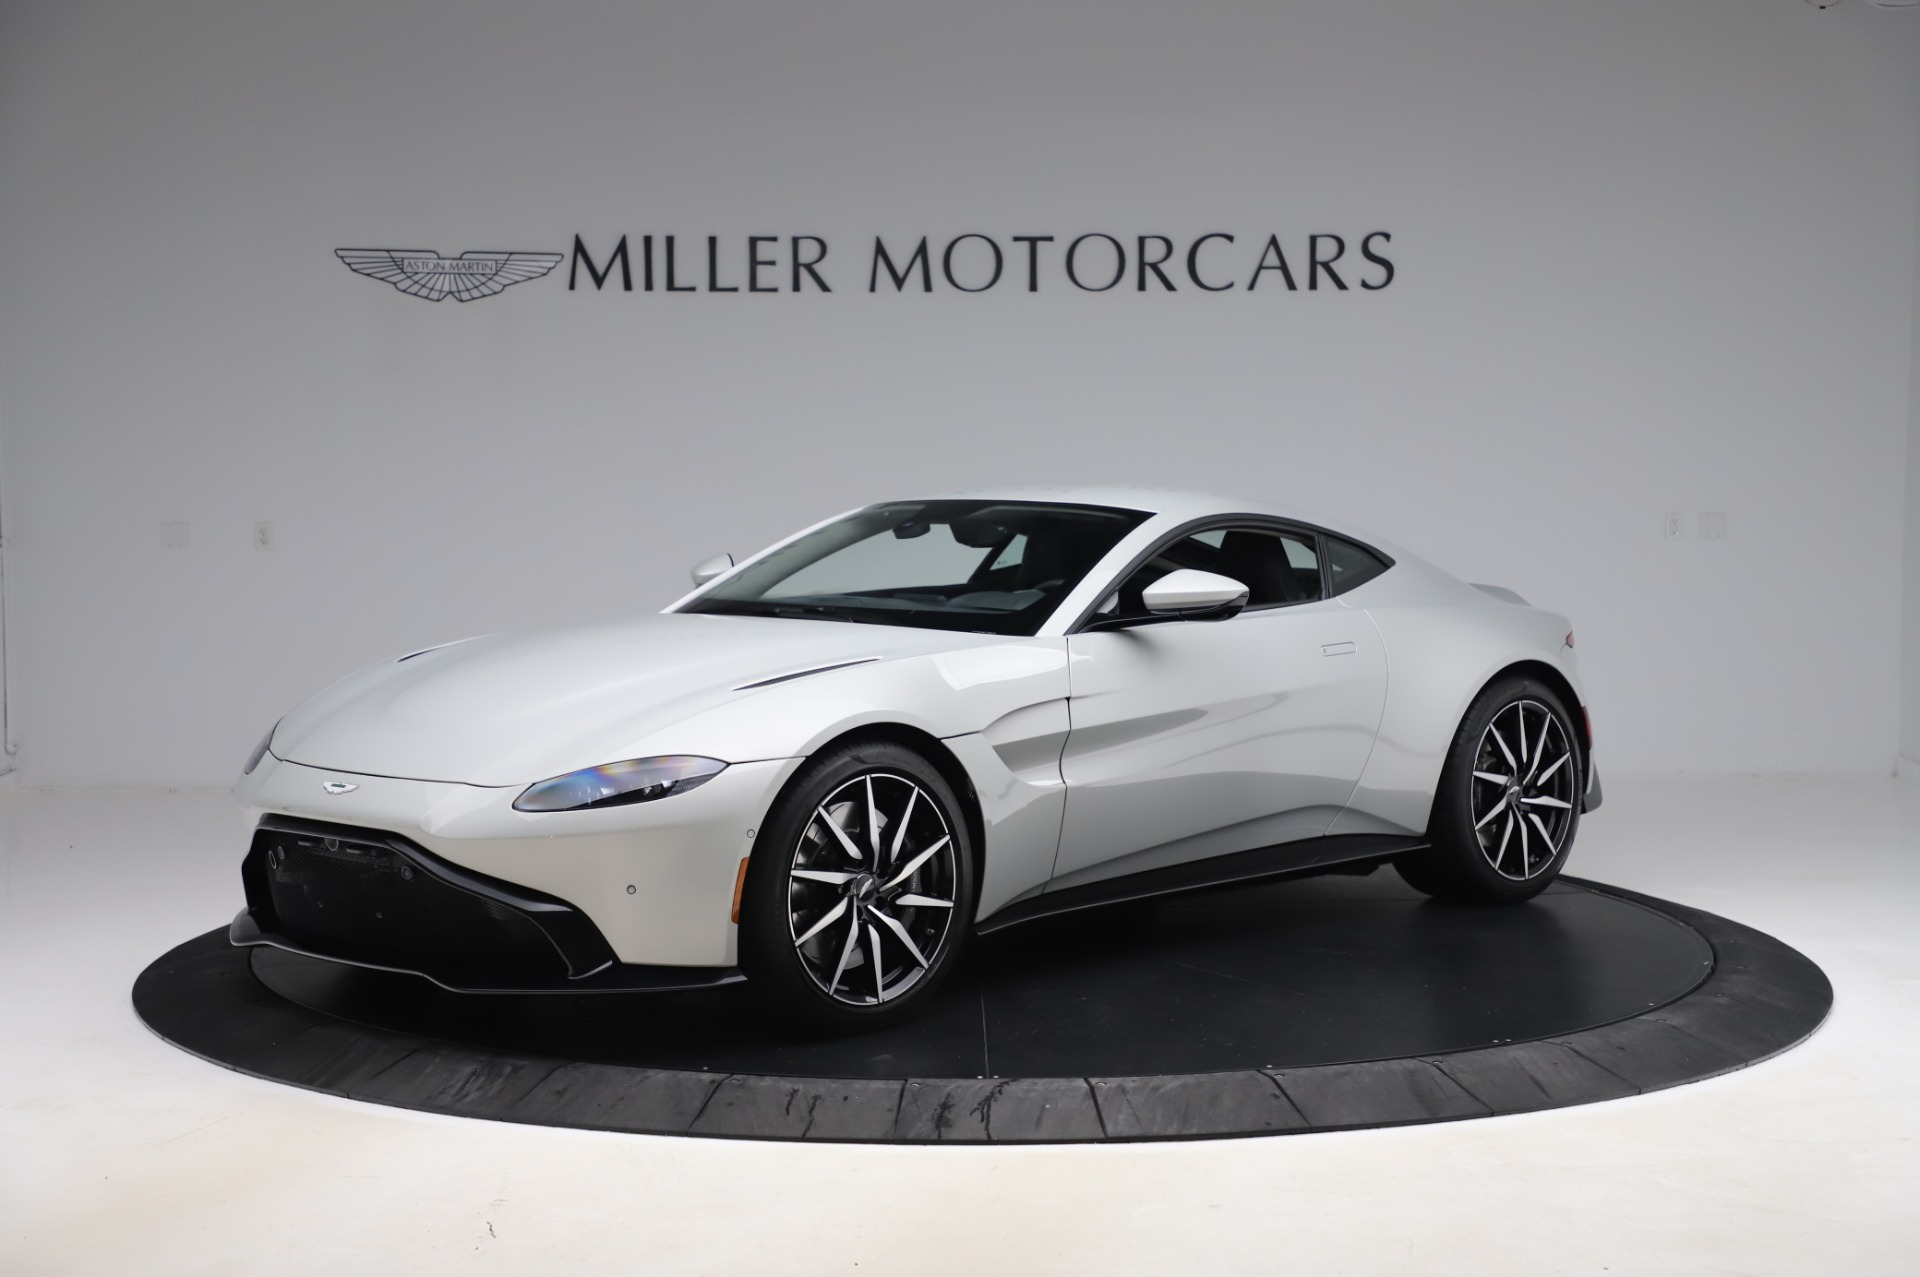 Used 2020 Aston Martin Vantage Coupe for sale $149,800 at Bugatti of Greenwich in Greenwich CT 06830 1